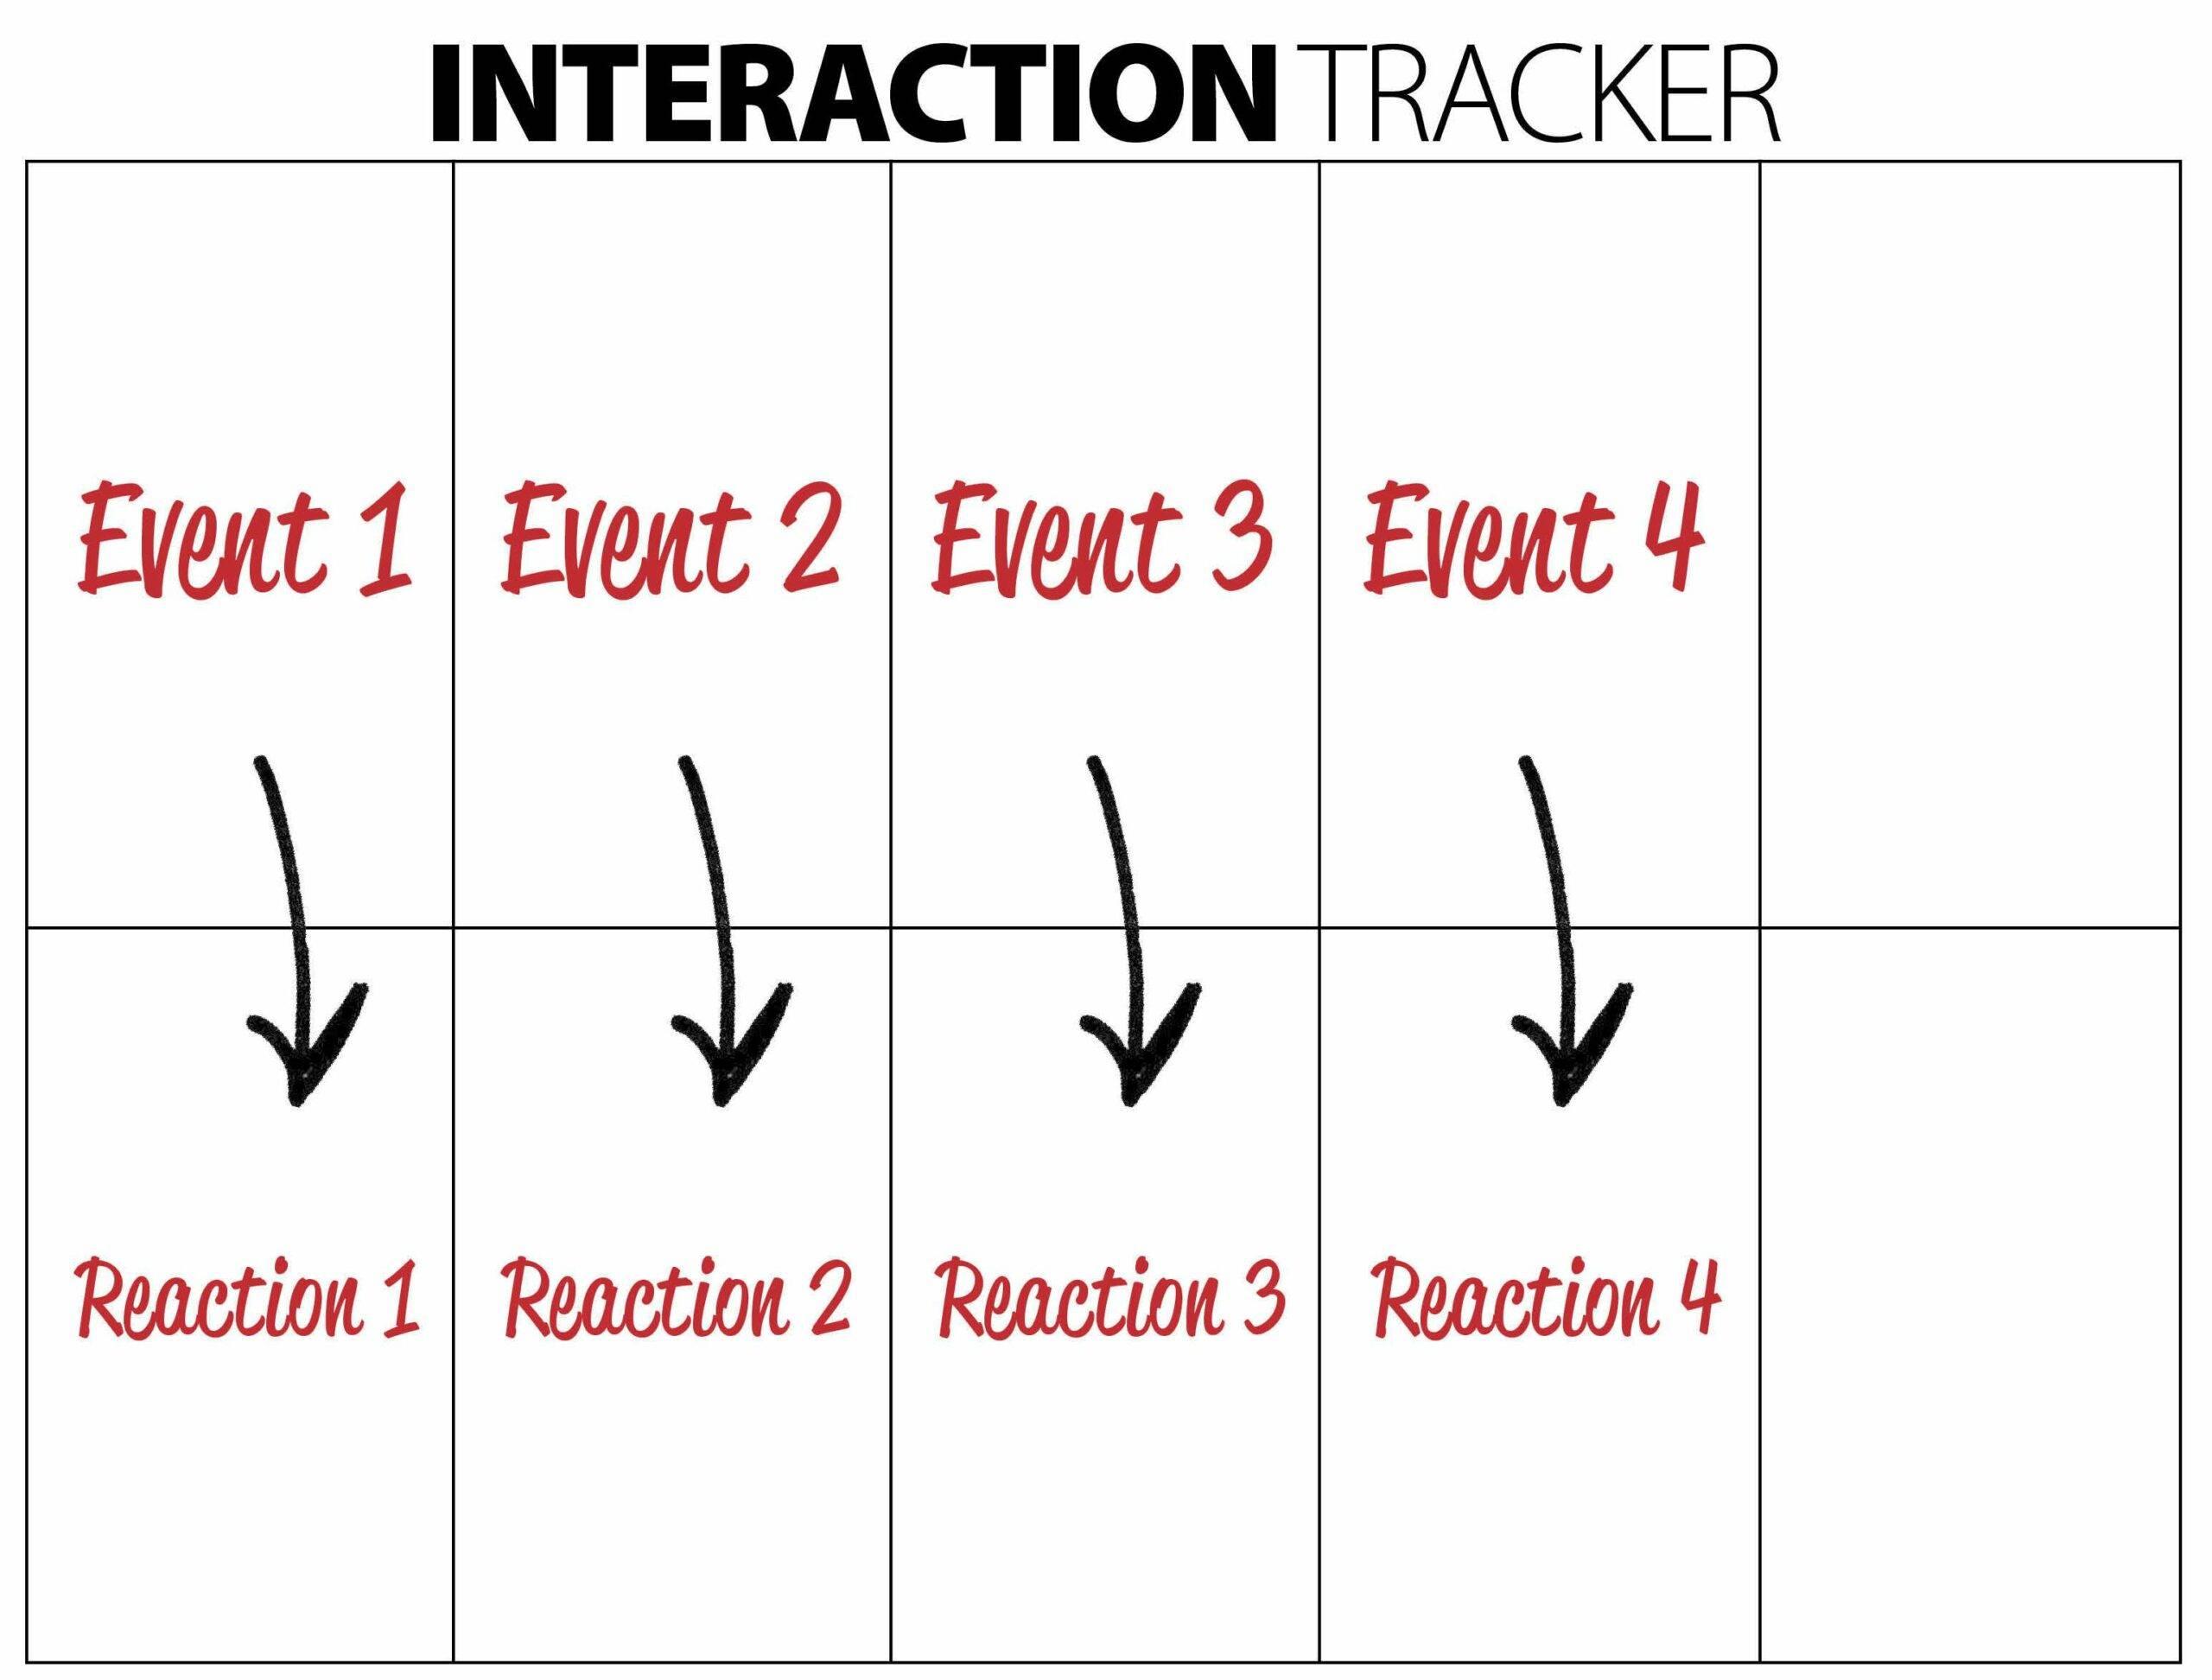 Interaction Tracker